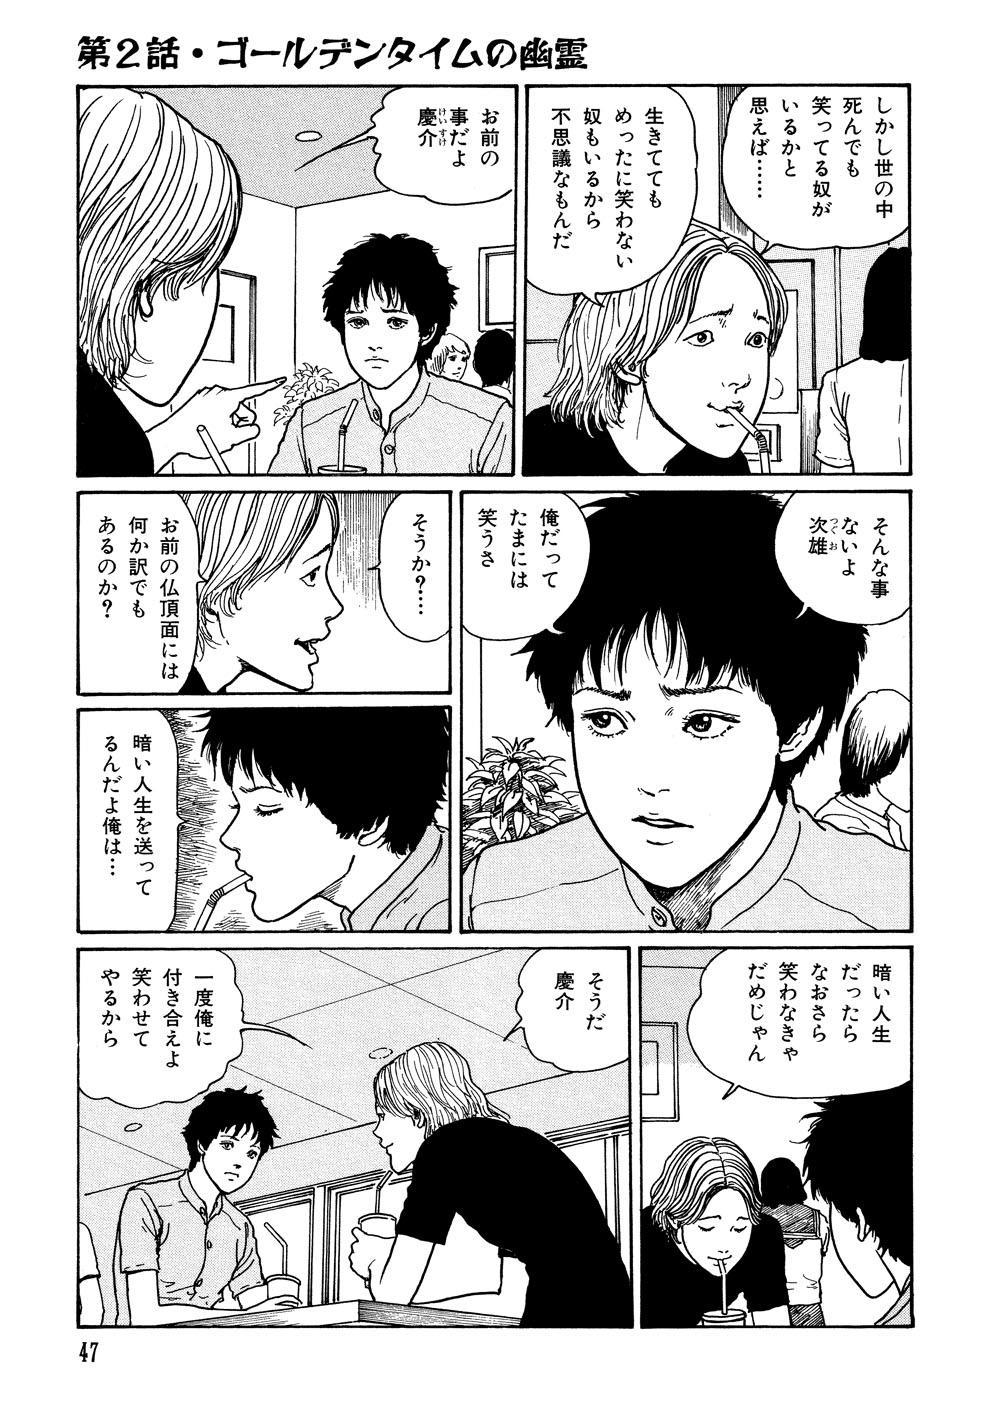 yami_0001_0047.jpg